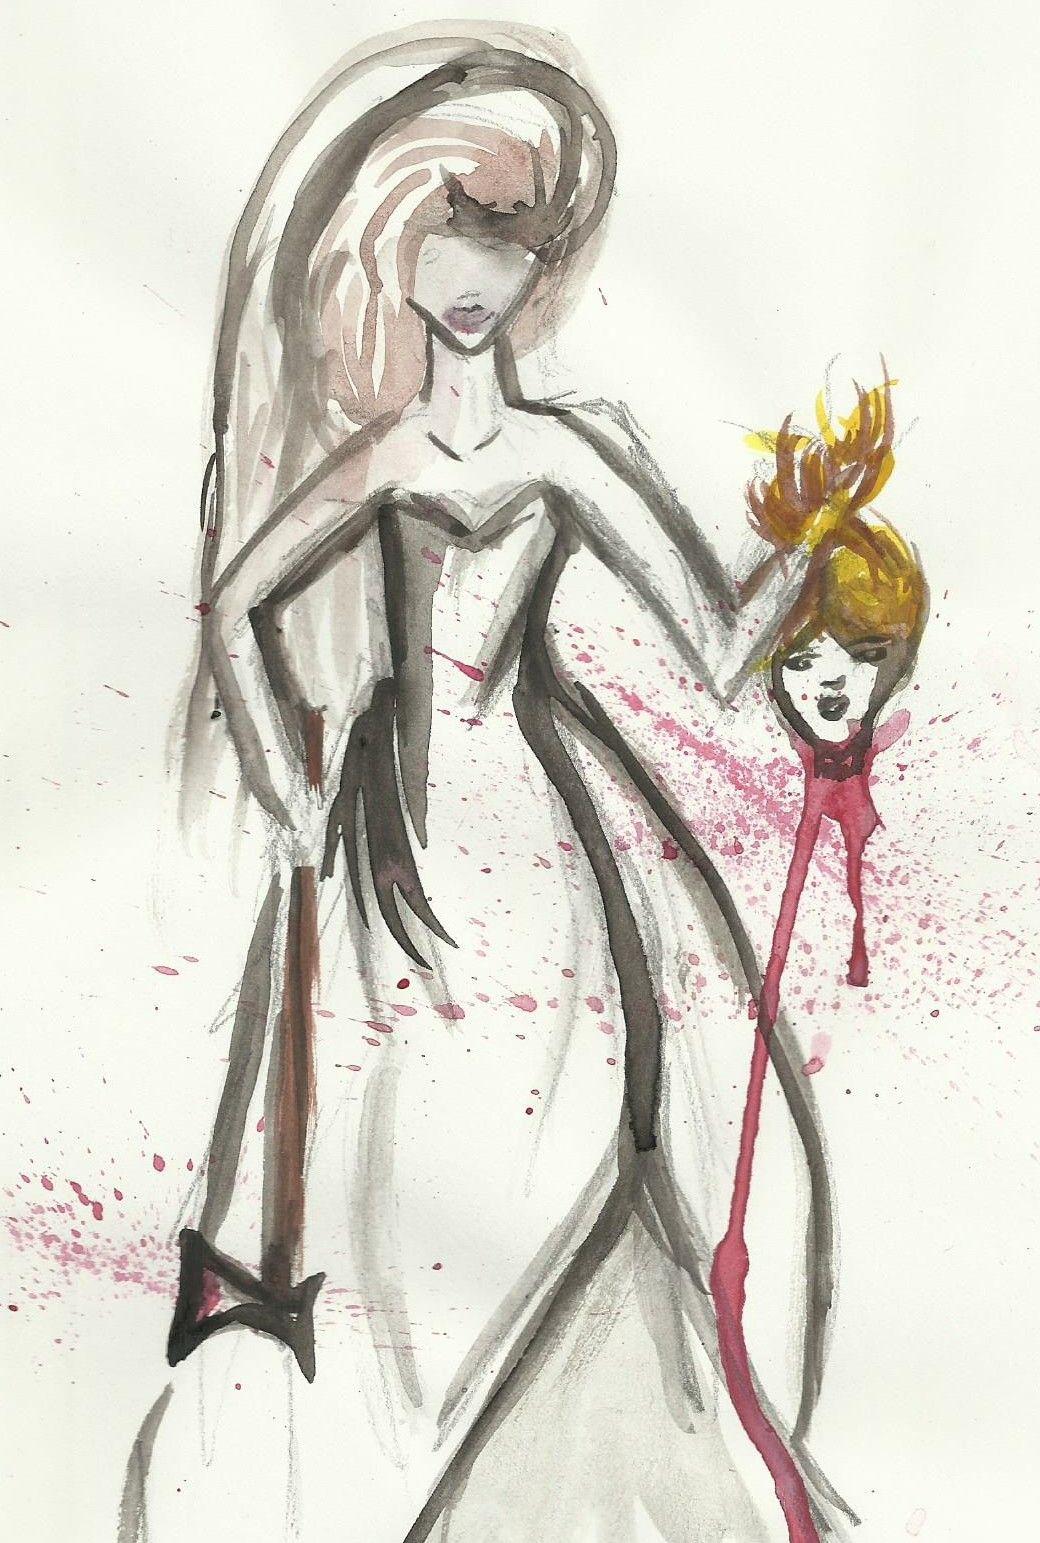 Decapitating Bride